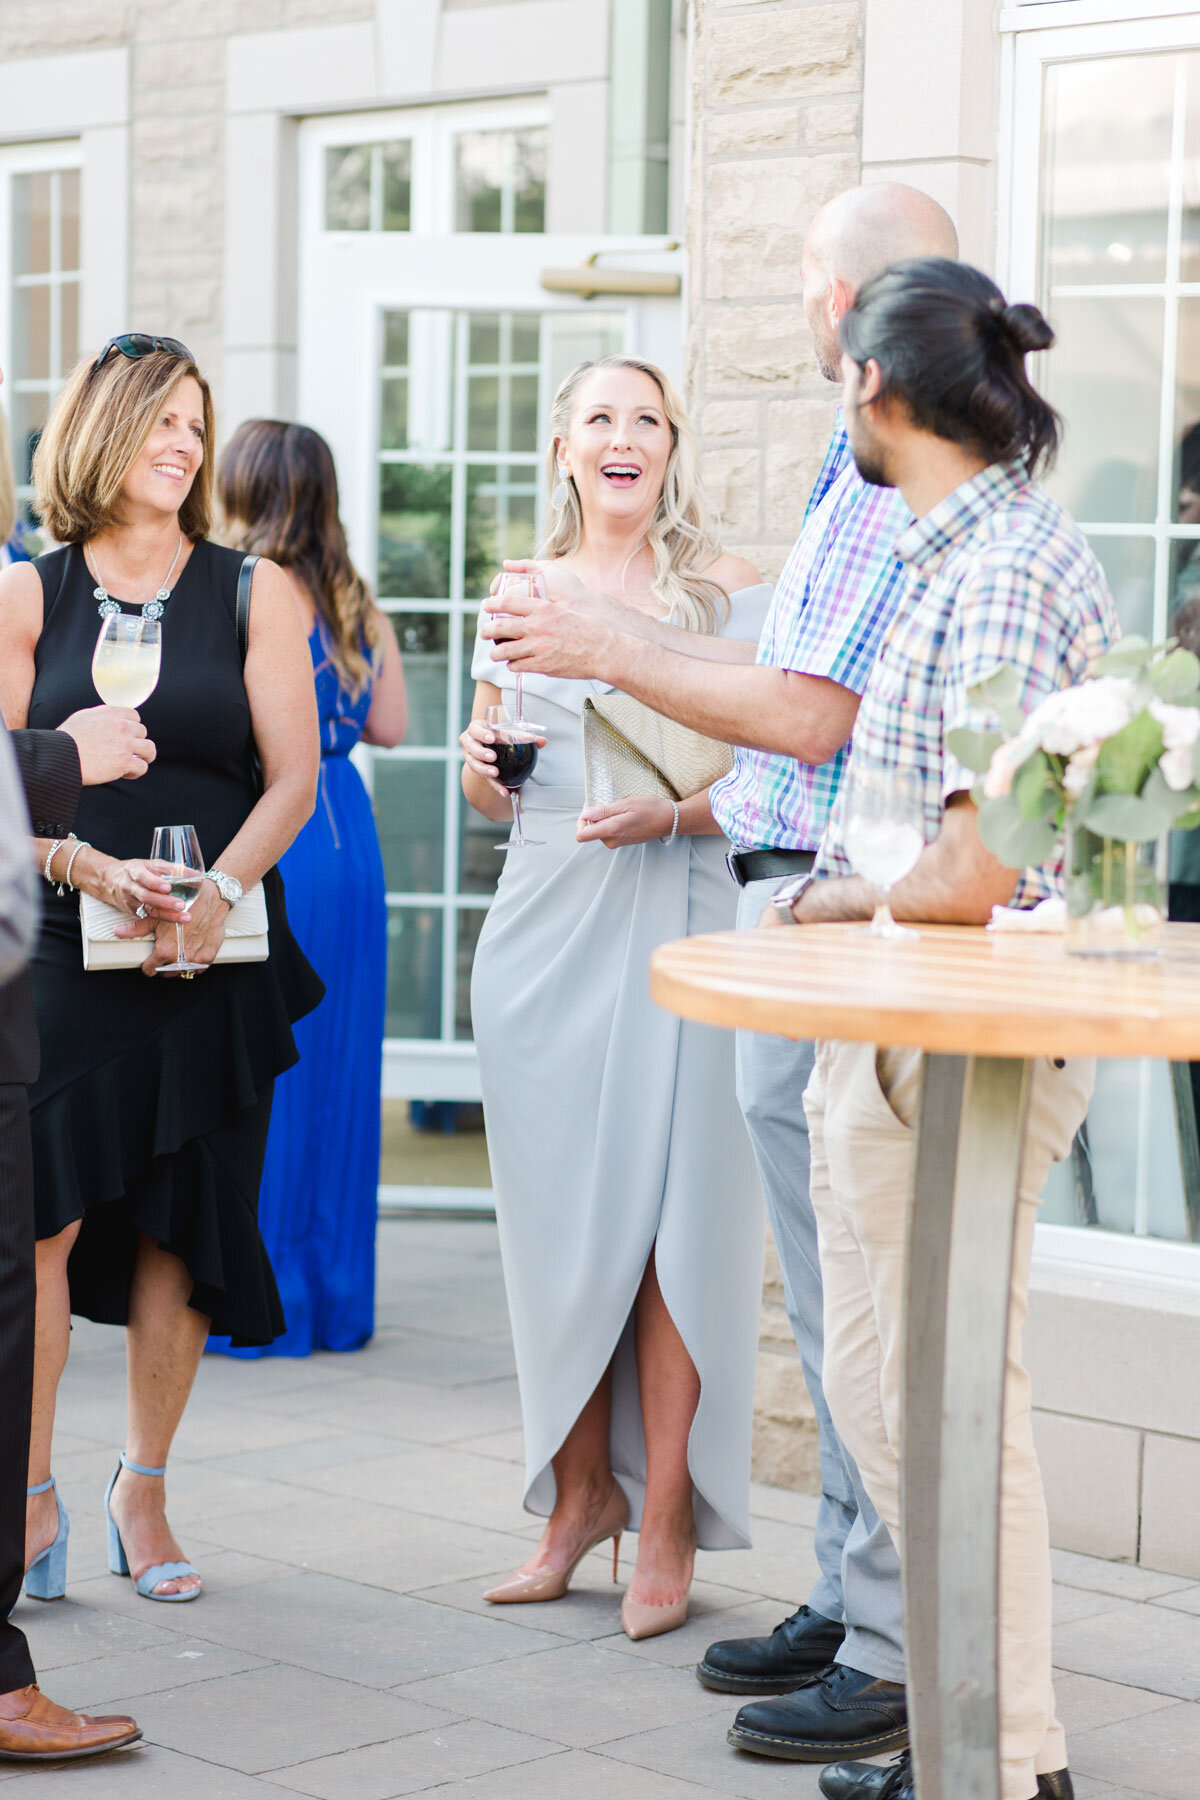 Chateau-des-Charmes-Wedding-Summer-Vineyard-Bride-Niagara-on-the-Lake-photos-by-Gemini-Photography-Ontario-0049.jpg